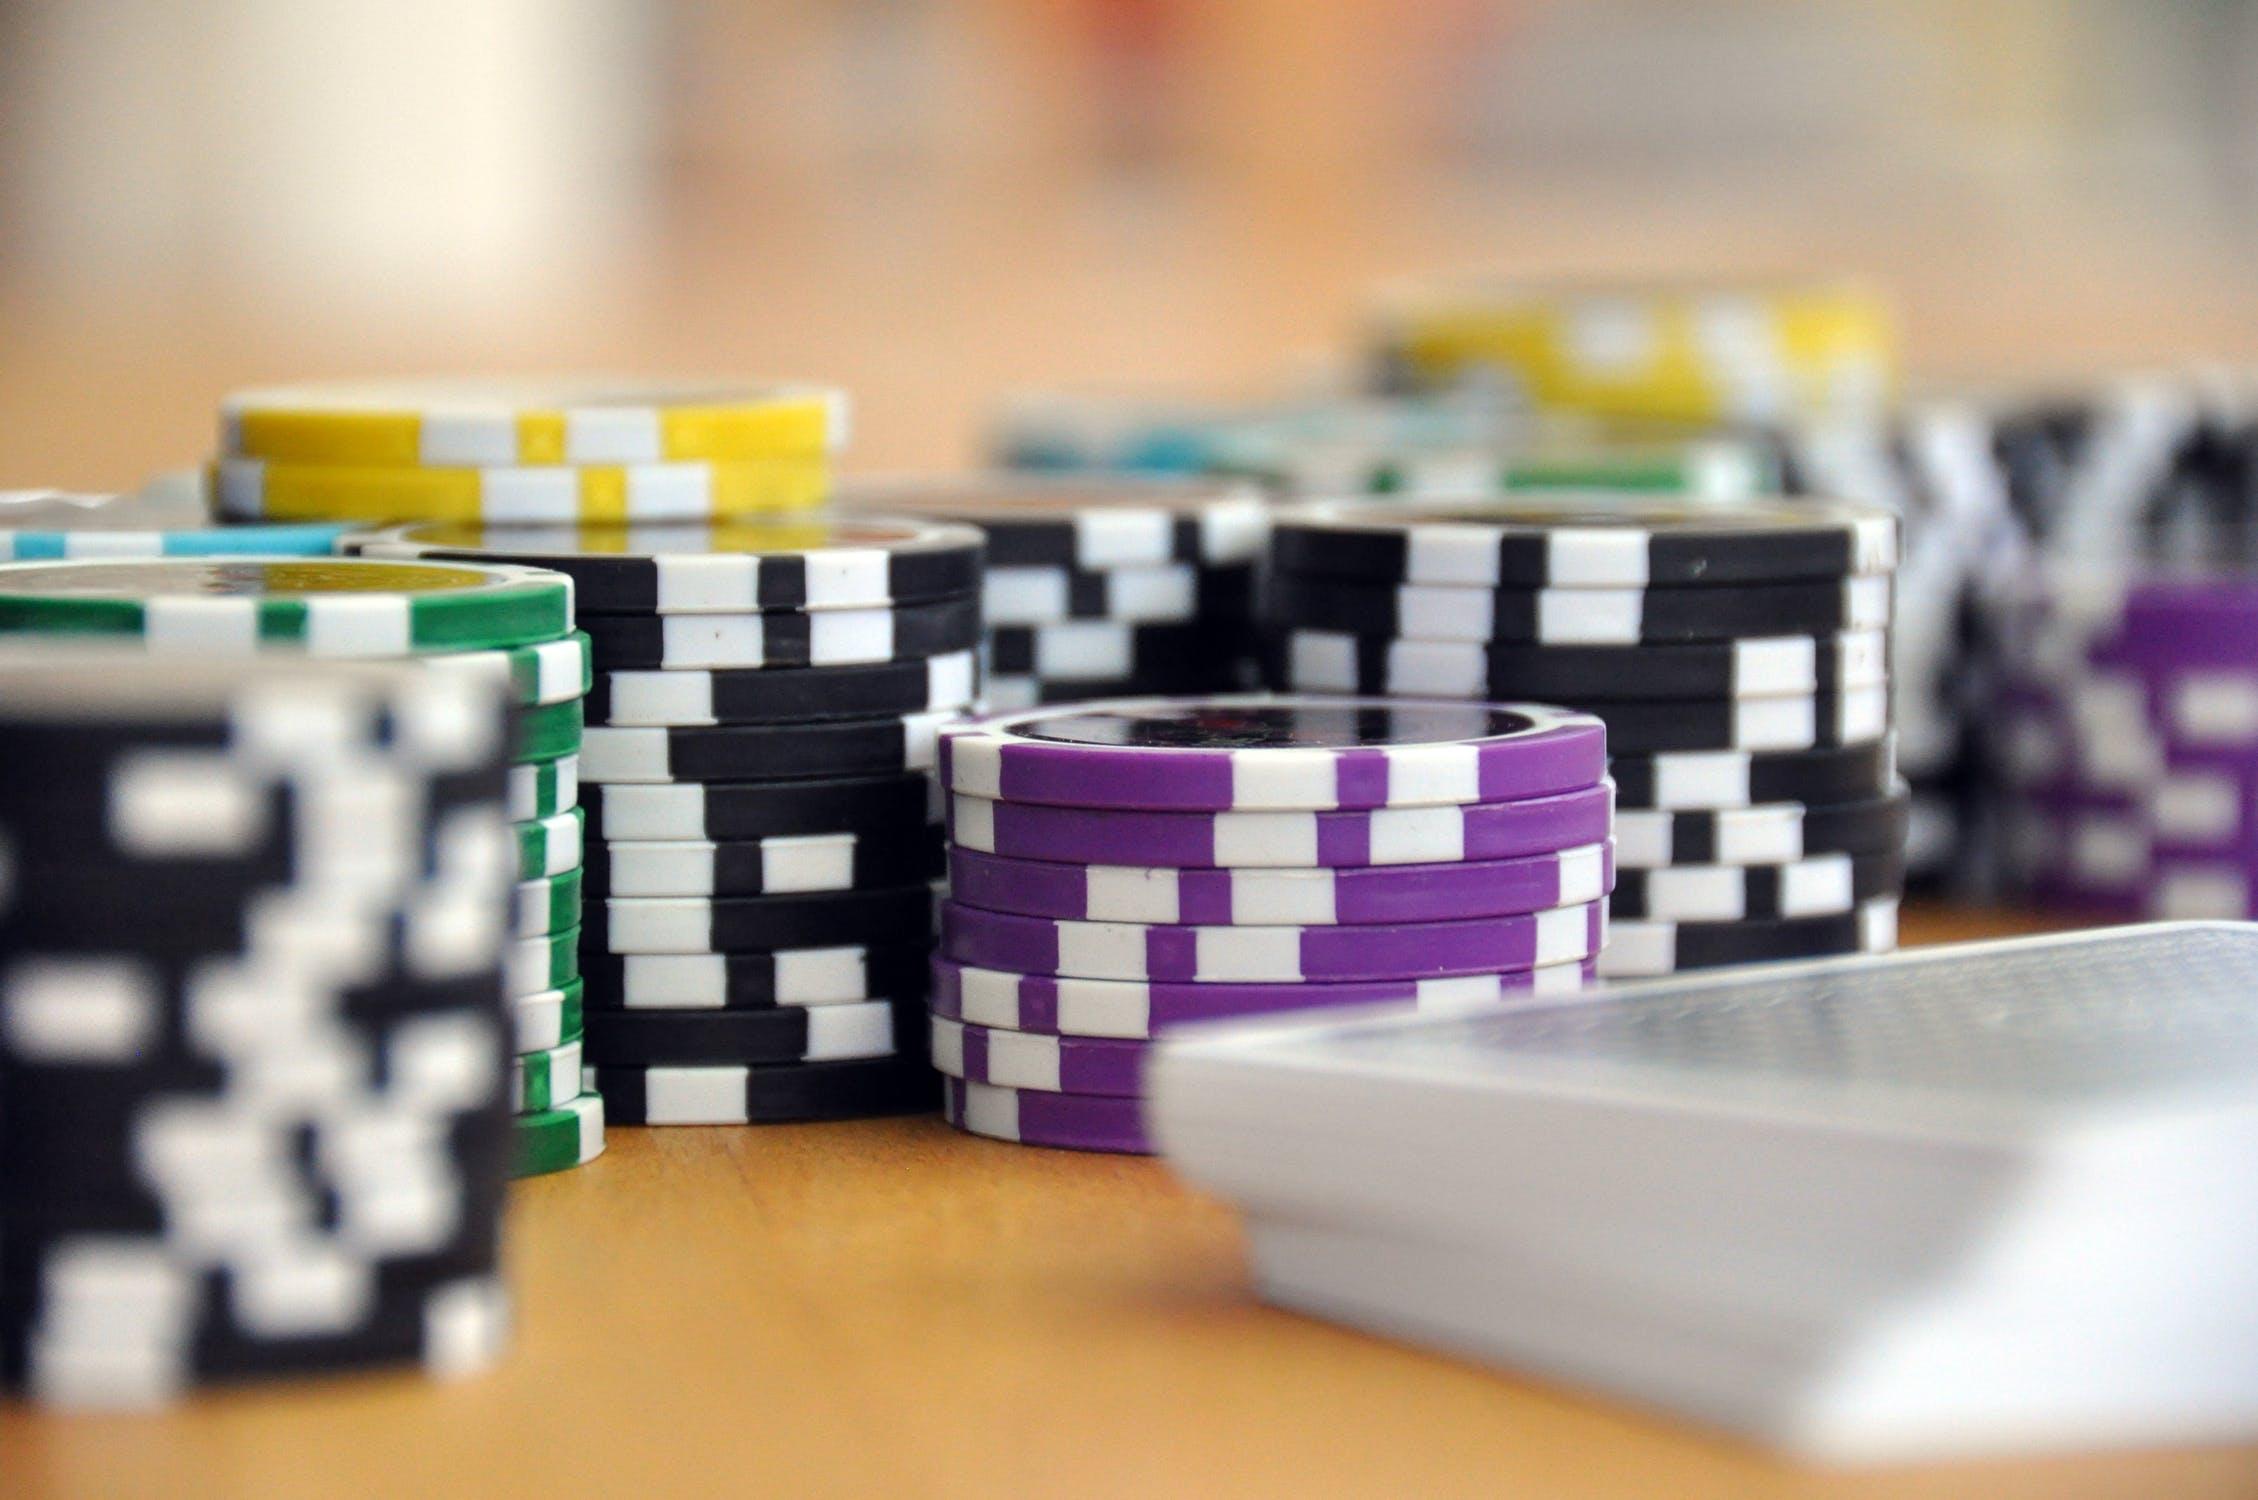 play-card-game-poker-poker-chips-39856 Image by Joachim Kirchner from Pixabay.com